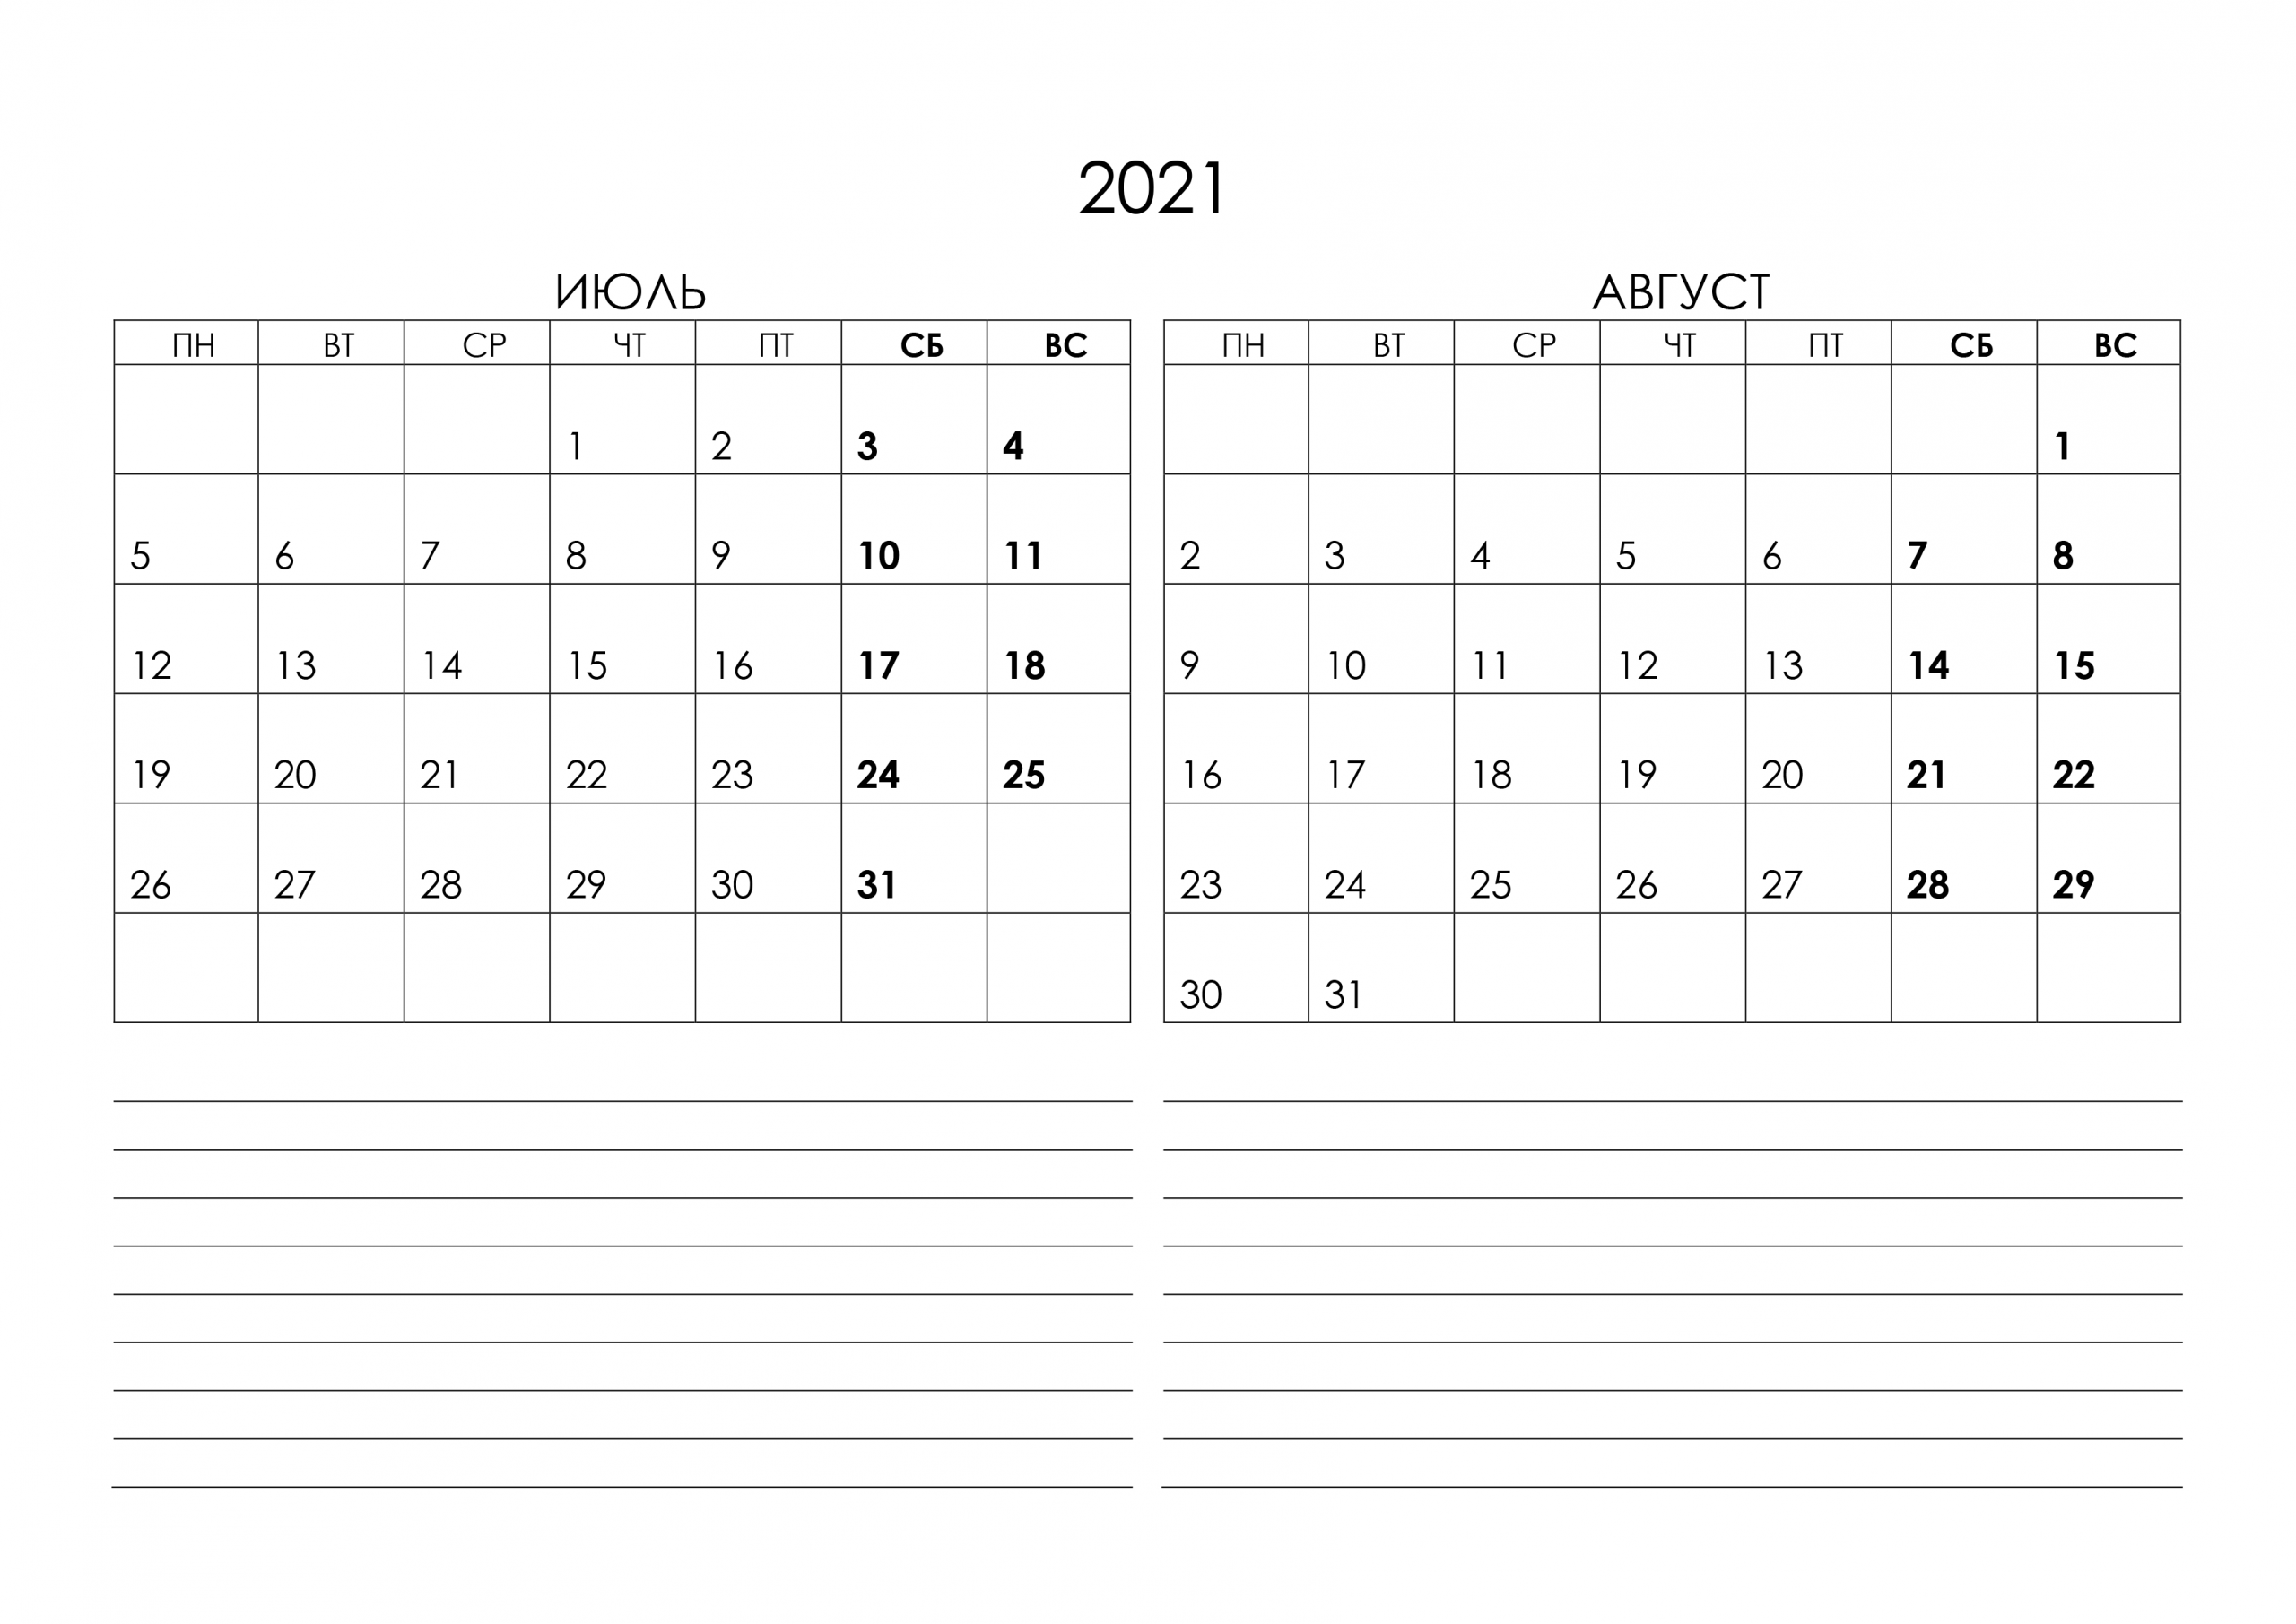 Календарь На Июль И Август 2021 Года — Calendar12.Ru within Календарь 2018-2021 На Одном Листе Graphics